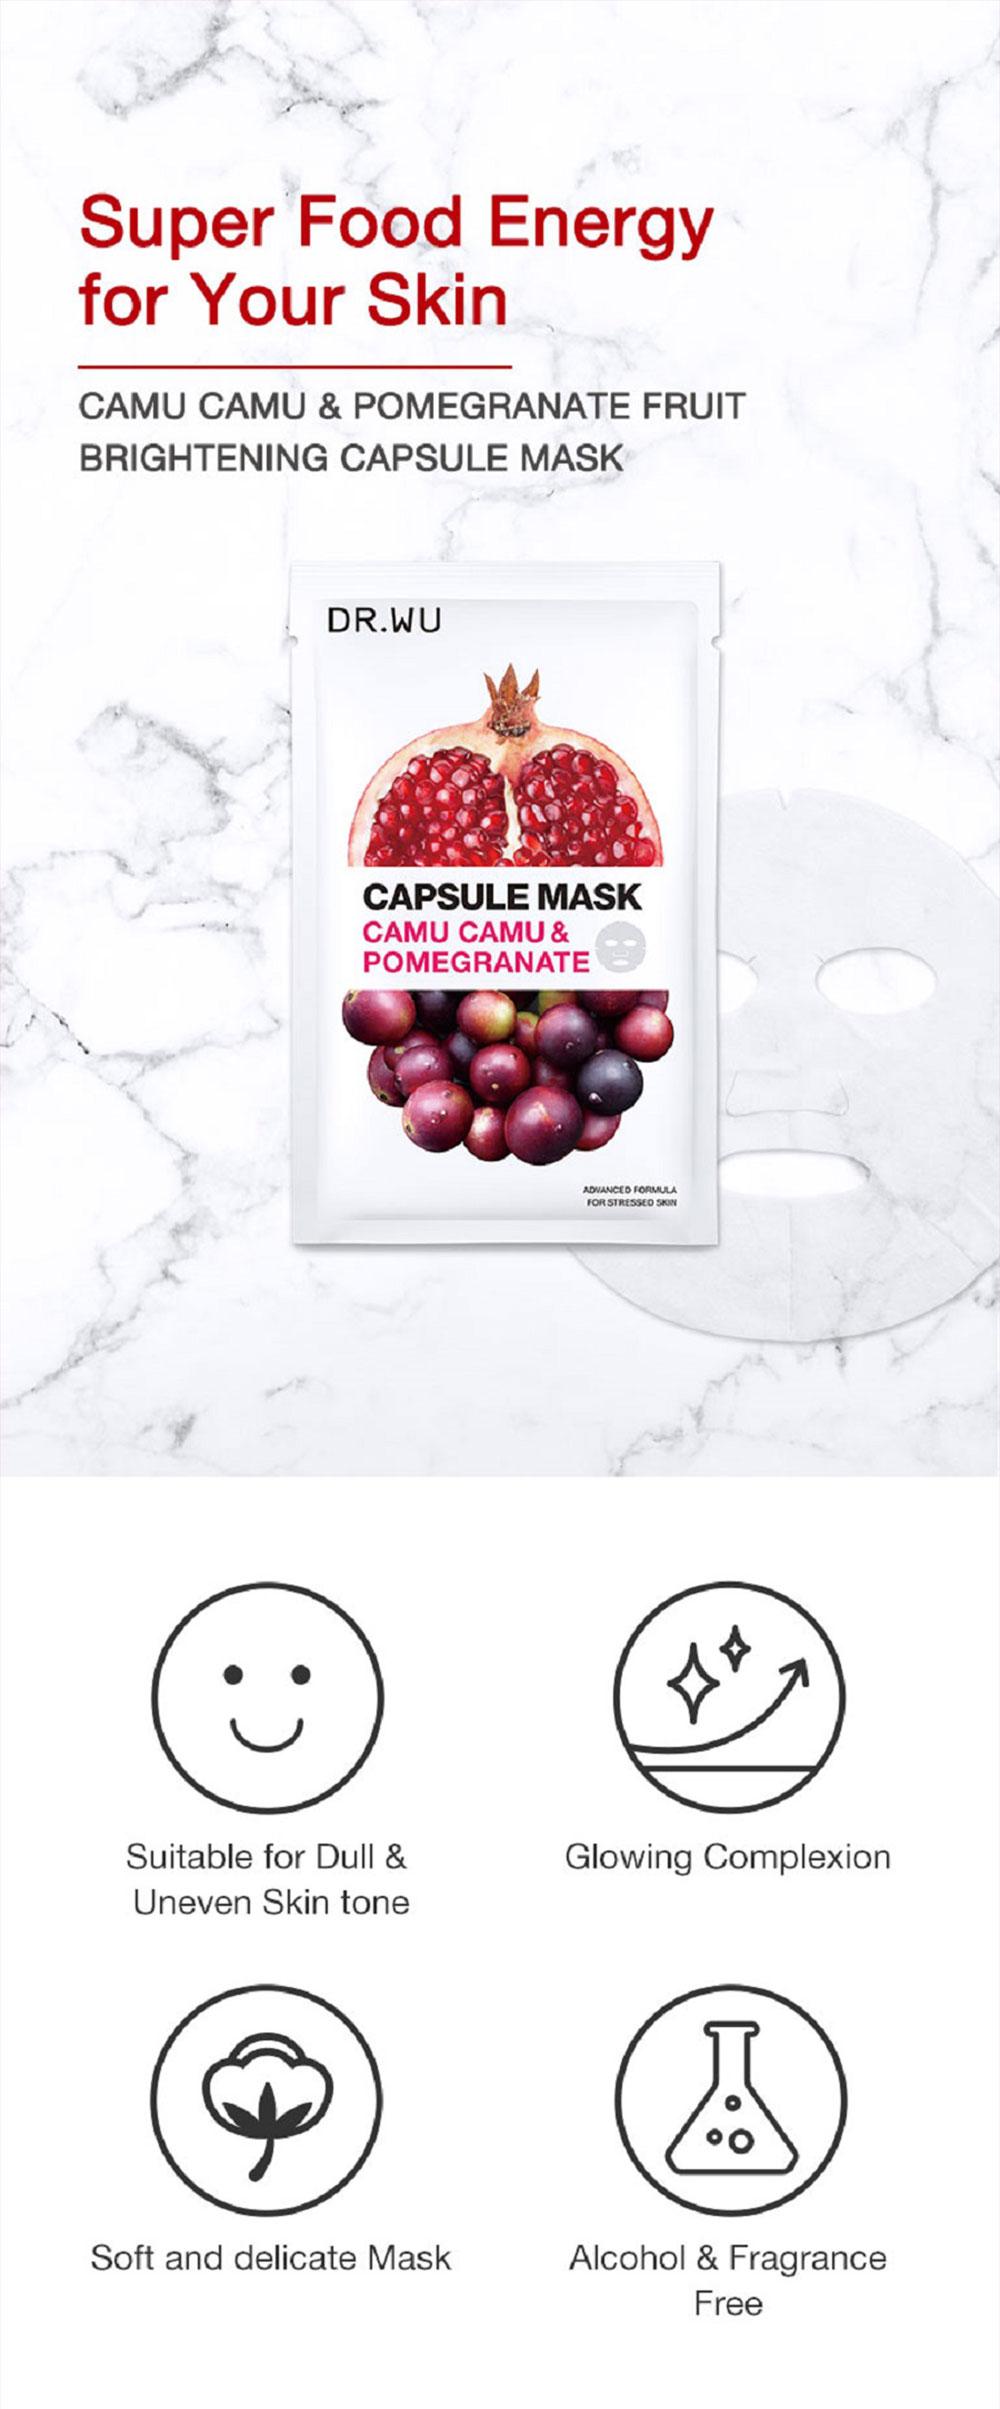 Camu Camu & Pomegranate Mask - Intro